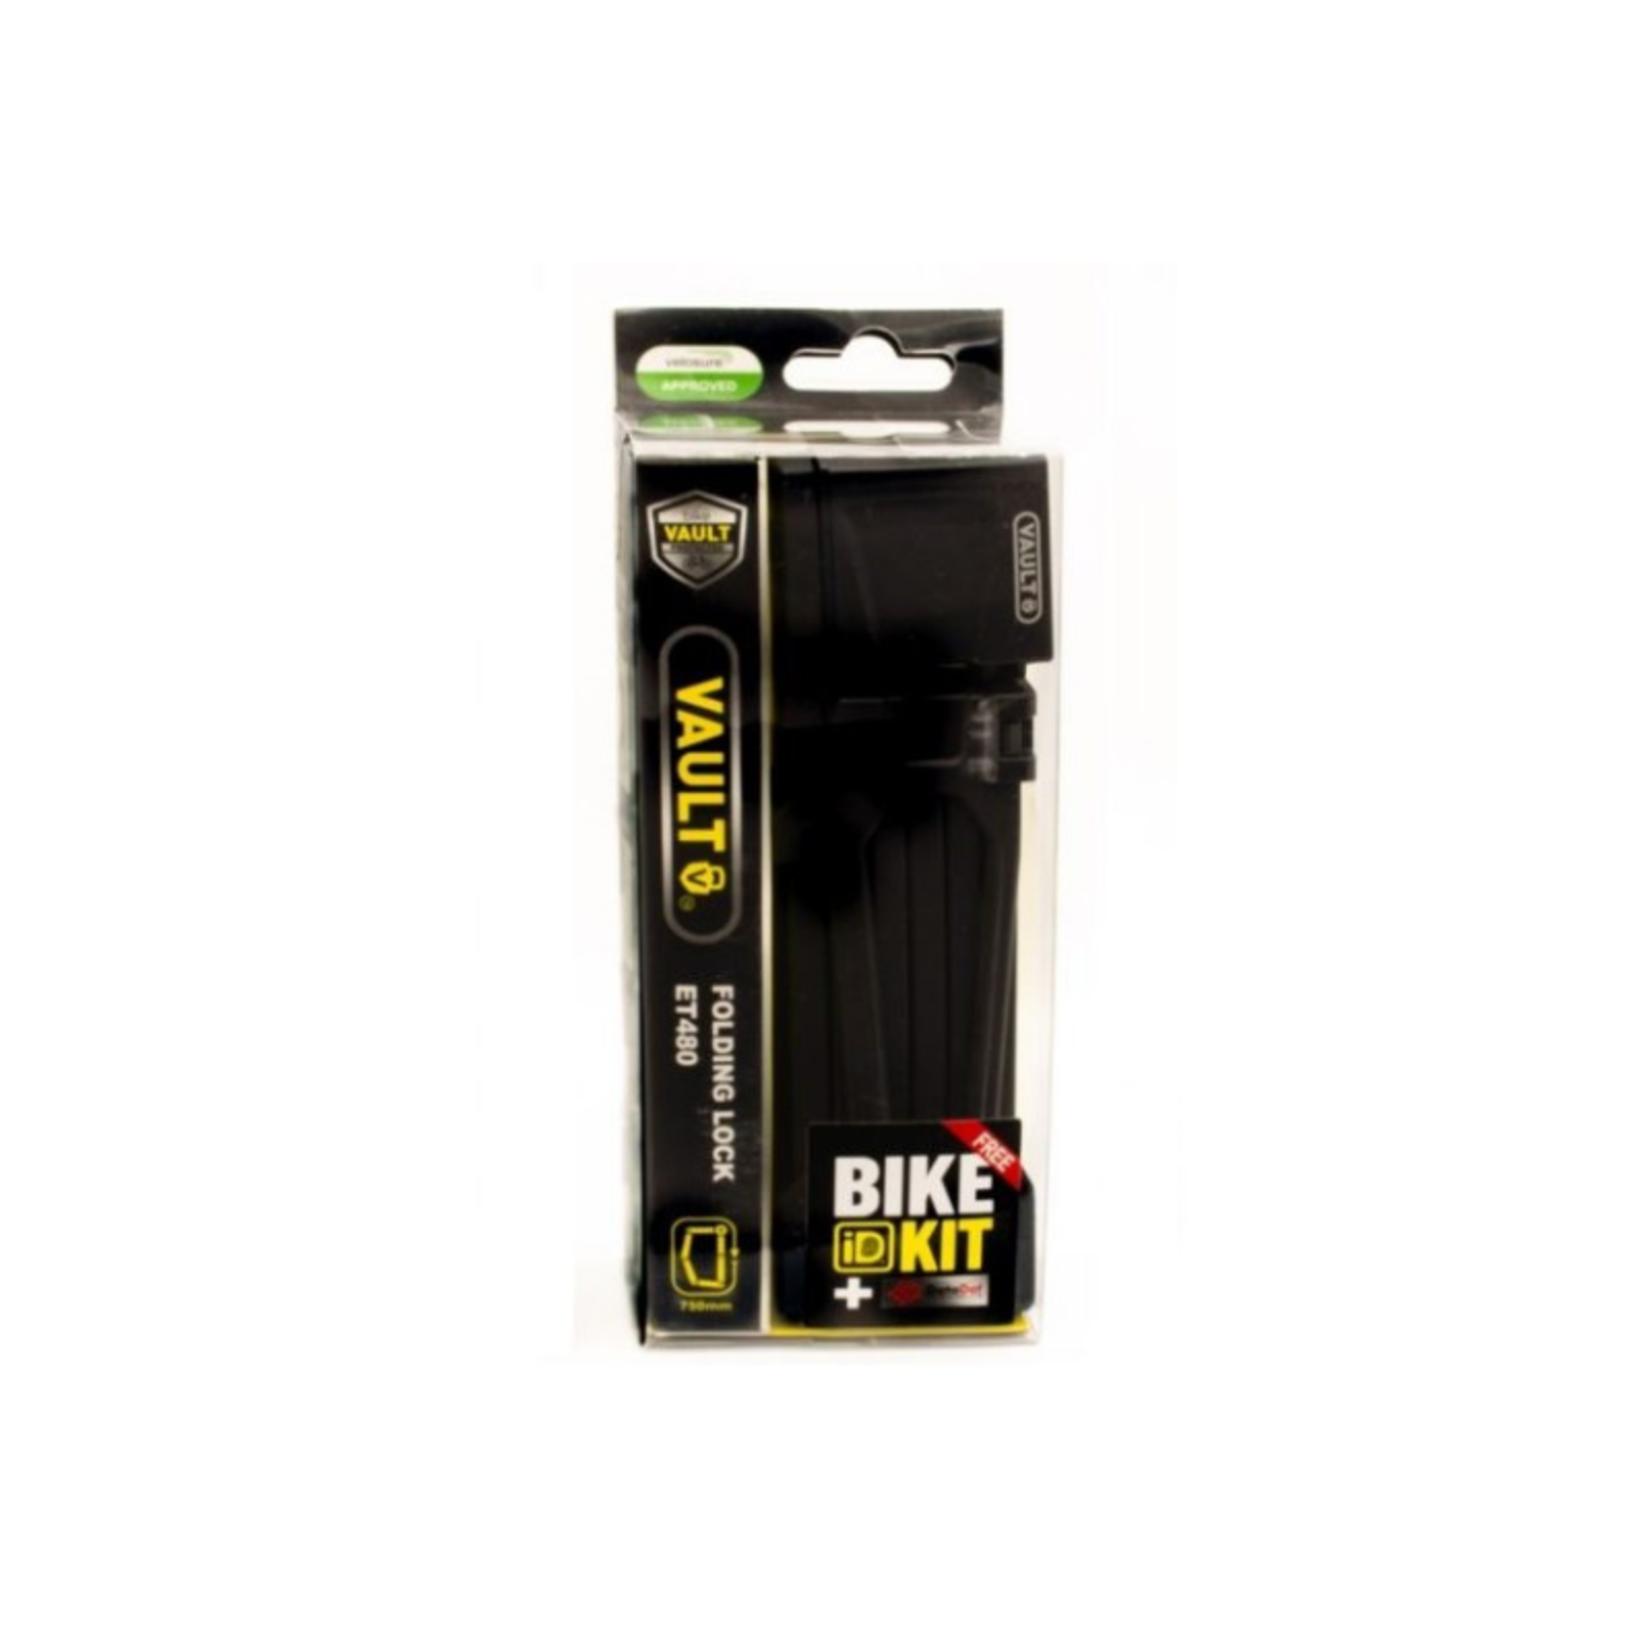 Vault ET480 Folding Lock 750mm + Bike ID Kit